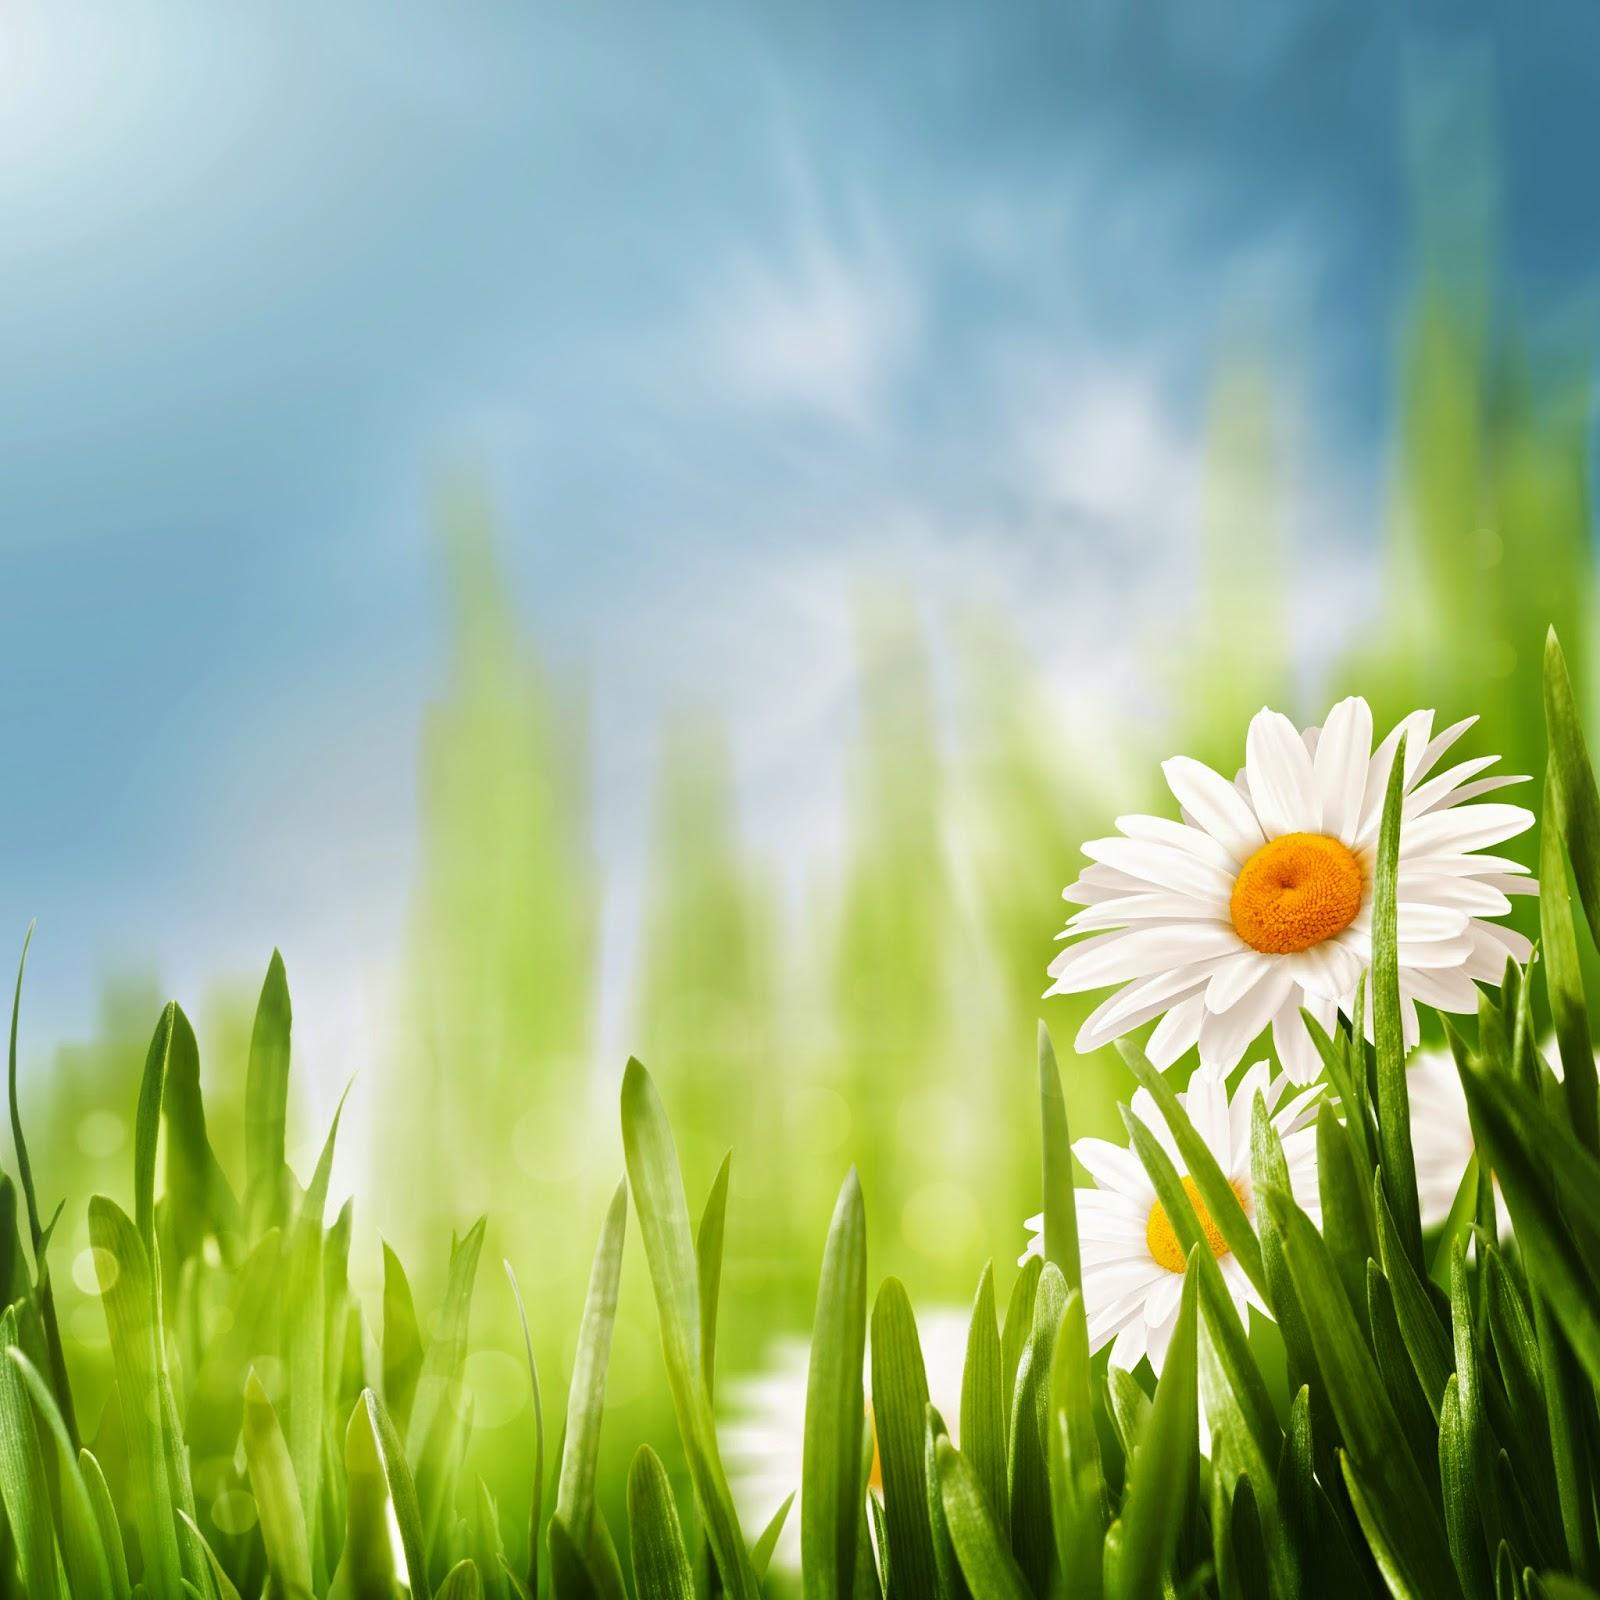 Imagenes fotograficas imagenes bonitas de flores para - Fotos de flores bonitas ...